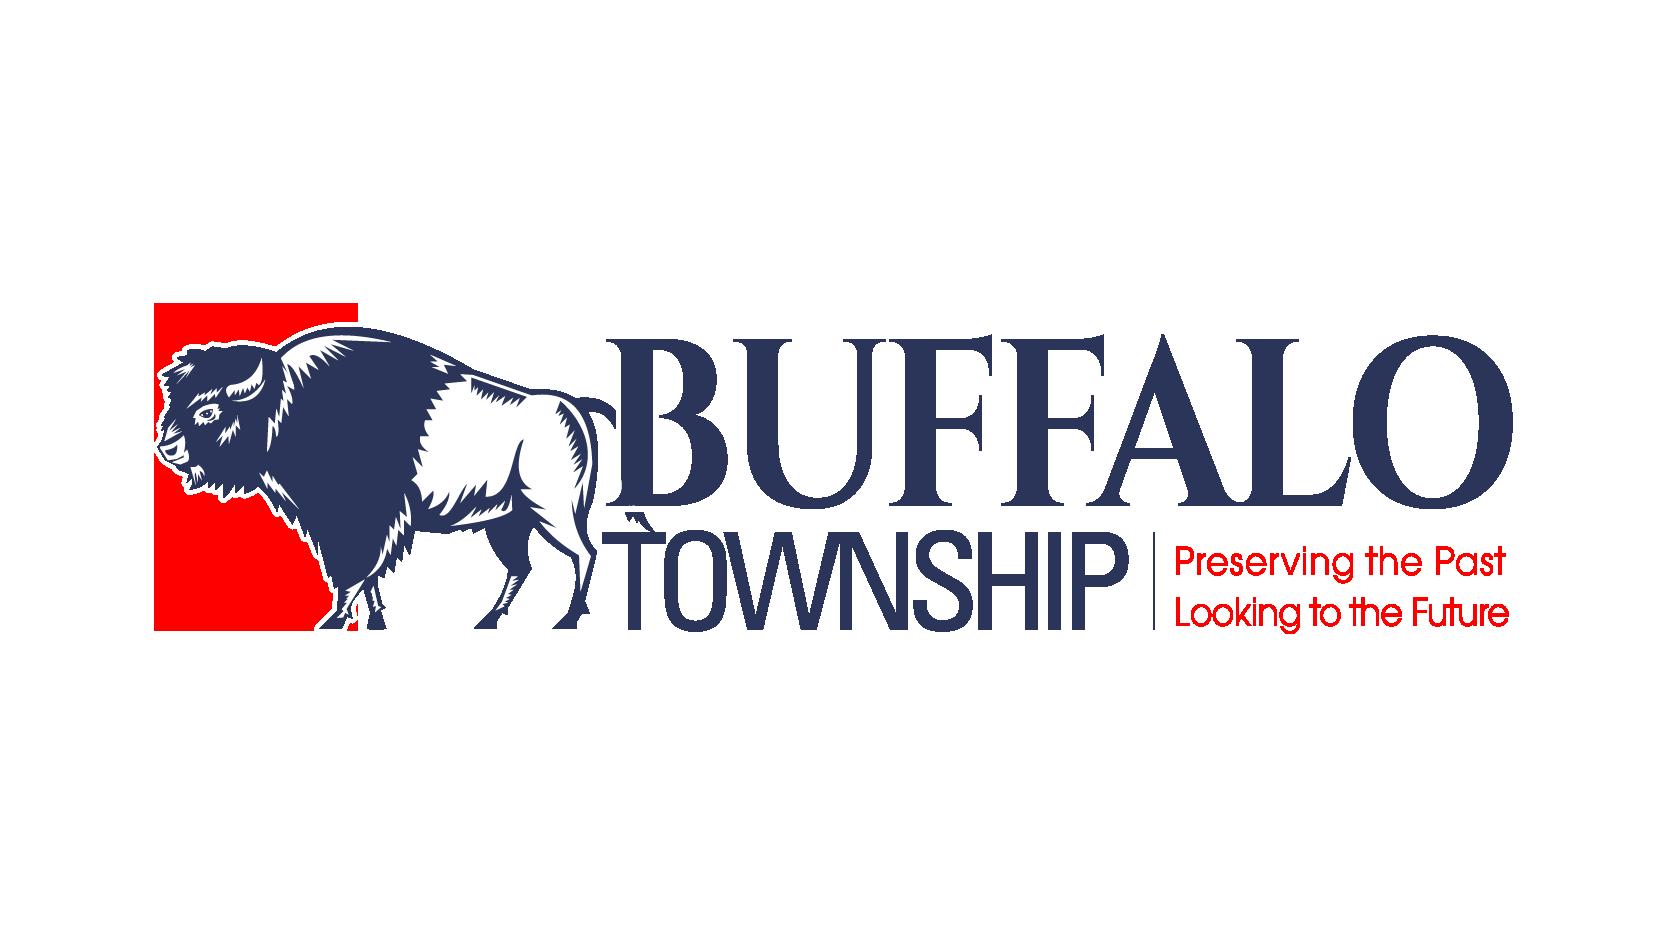 Buffalo Township